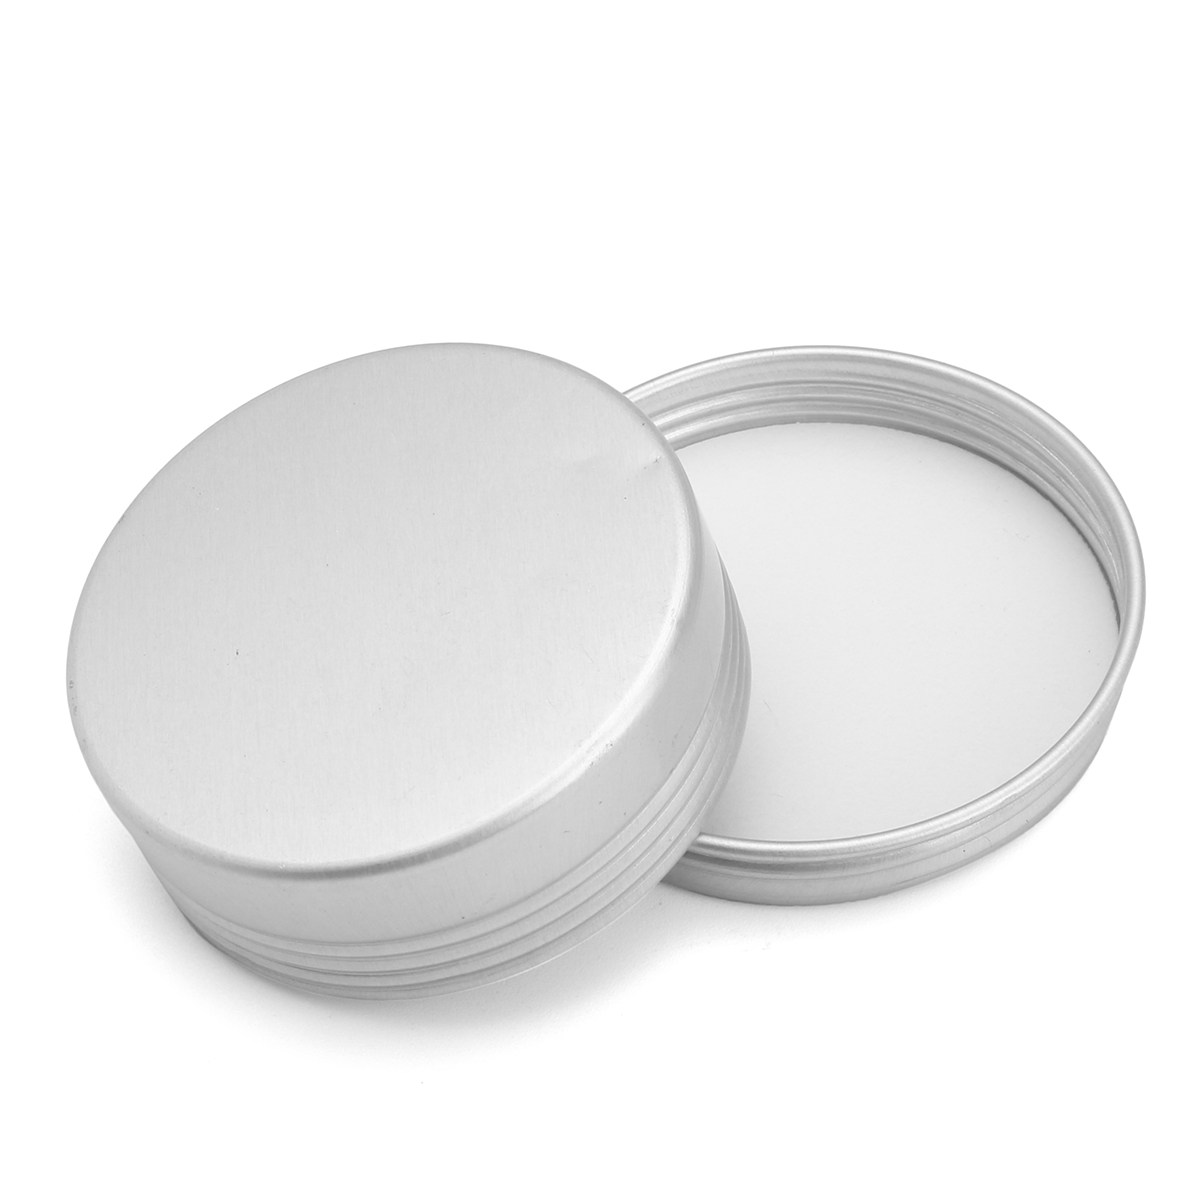 b159a9c9e53e US $8.85 |24pcs 25g Empty Aluminum Cans Silver Round Cosmetic Cream Jar  Hair Wax Case Lip Balm Container Makeup Tin Pot + Screw Thread Lid-in ...